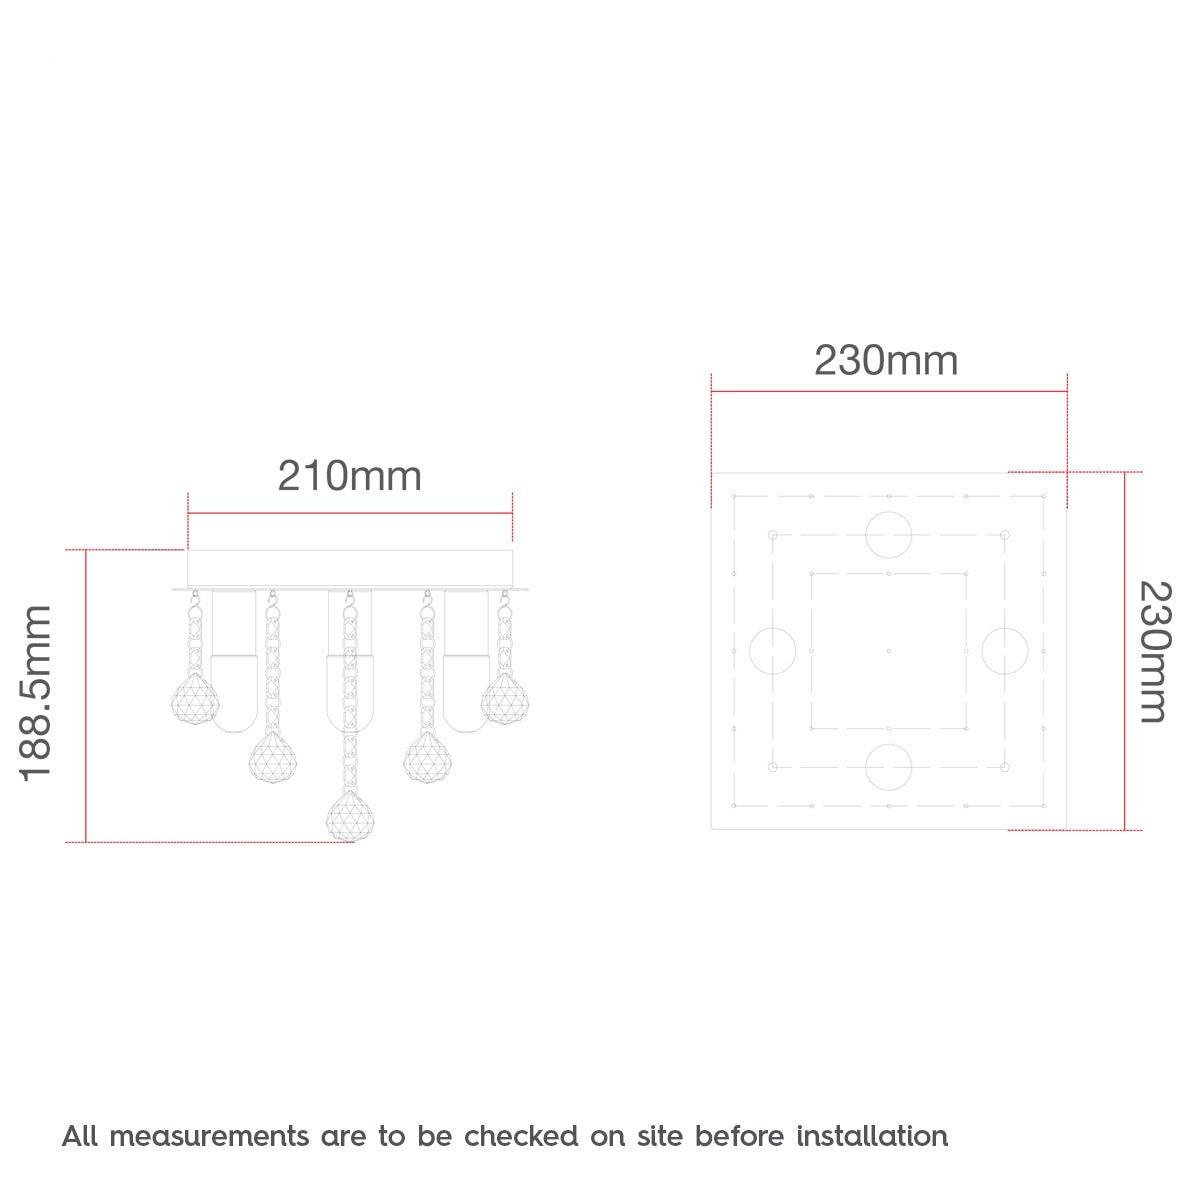 Dimensions for Forum ora square flush bathroom ceiling light